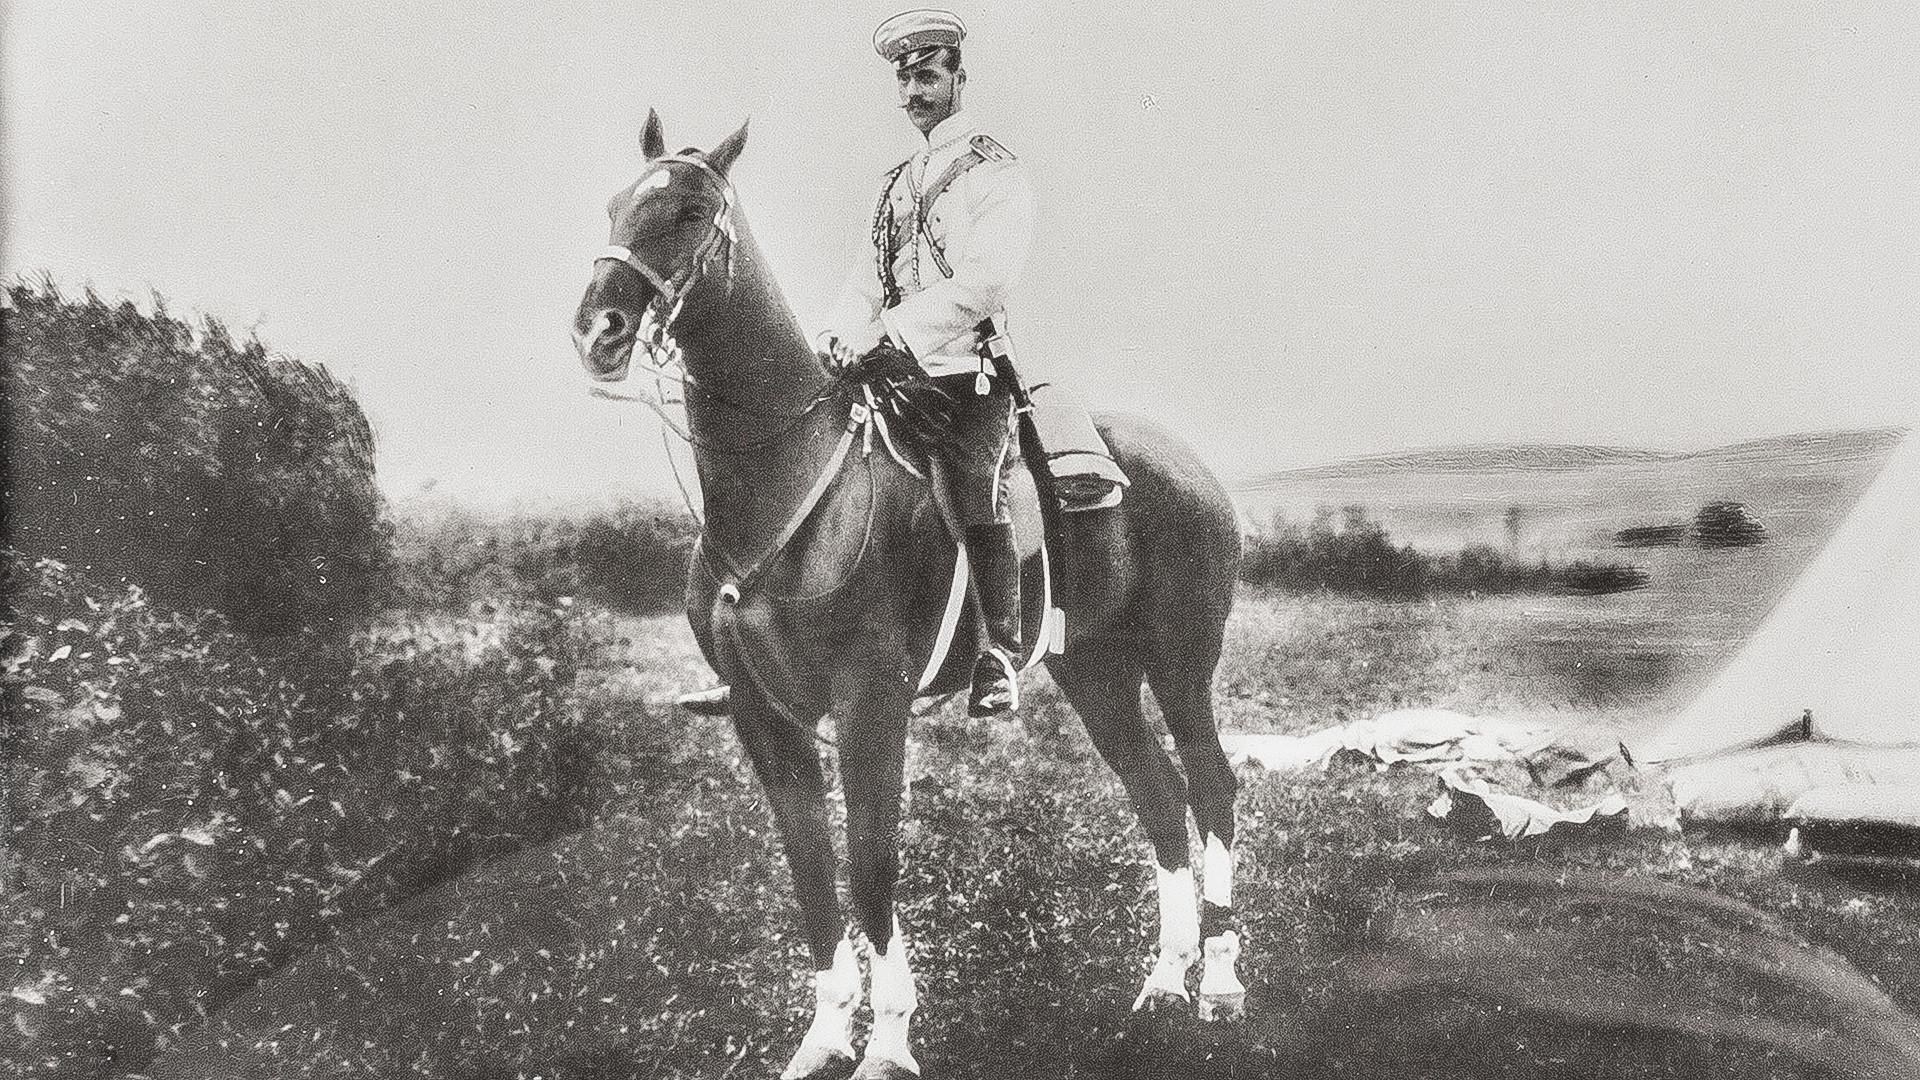 Michael Alexandrovich (1878-1918) on horseback.